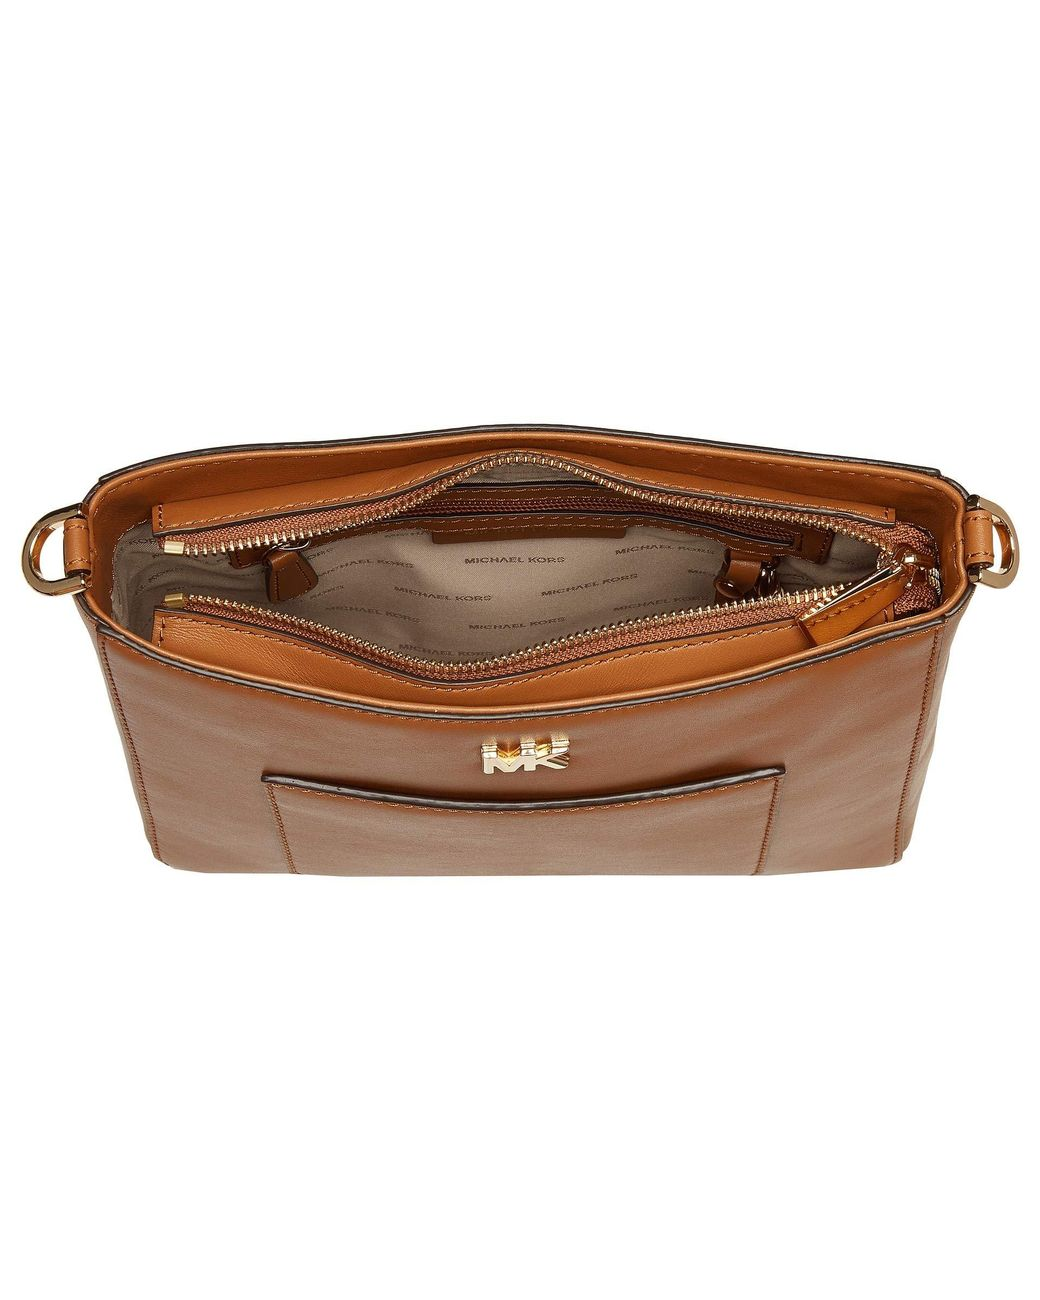 6b77d10e22f9 MICHAEL Michael Kors Gloria Pocket Swing Pack in Brown - Save 5% - Lyst